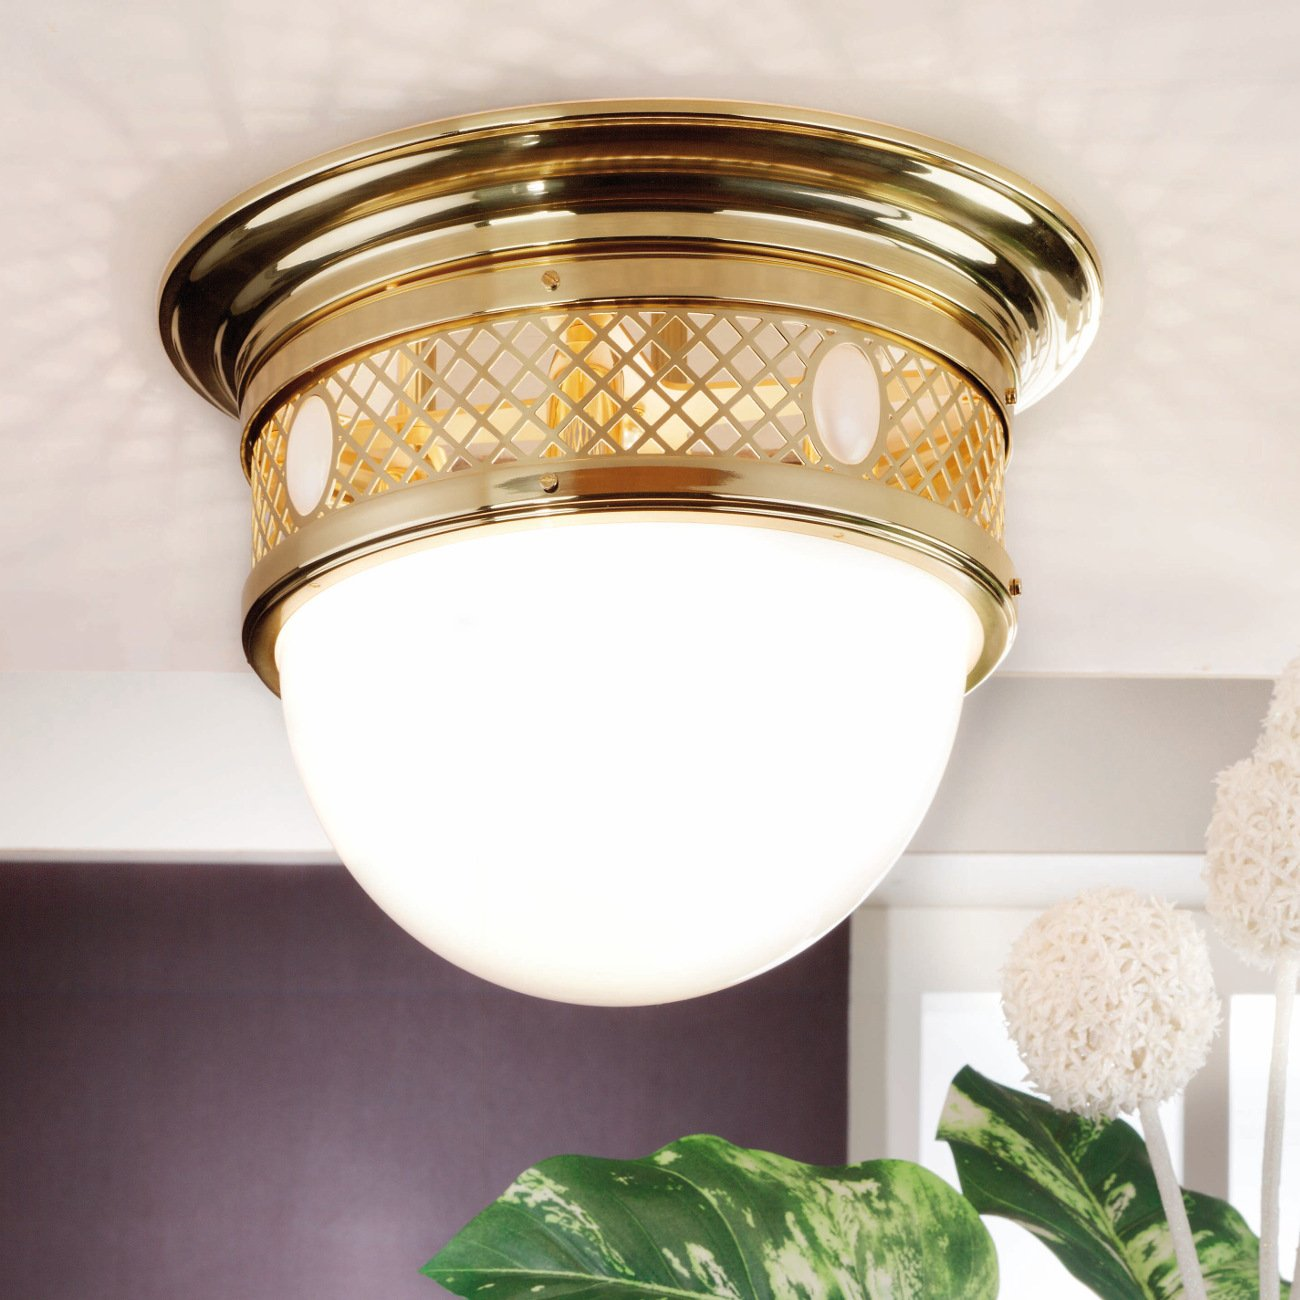 Art Deco Lampen Bilder Stehlampe Tiffany Art Deco Stil Der